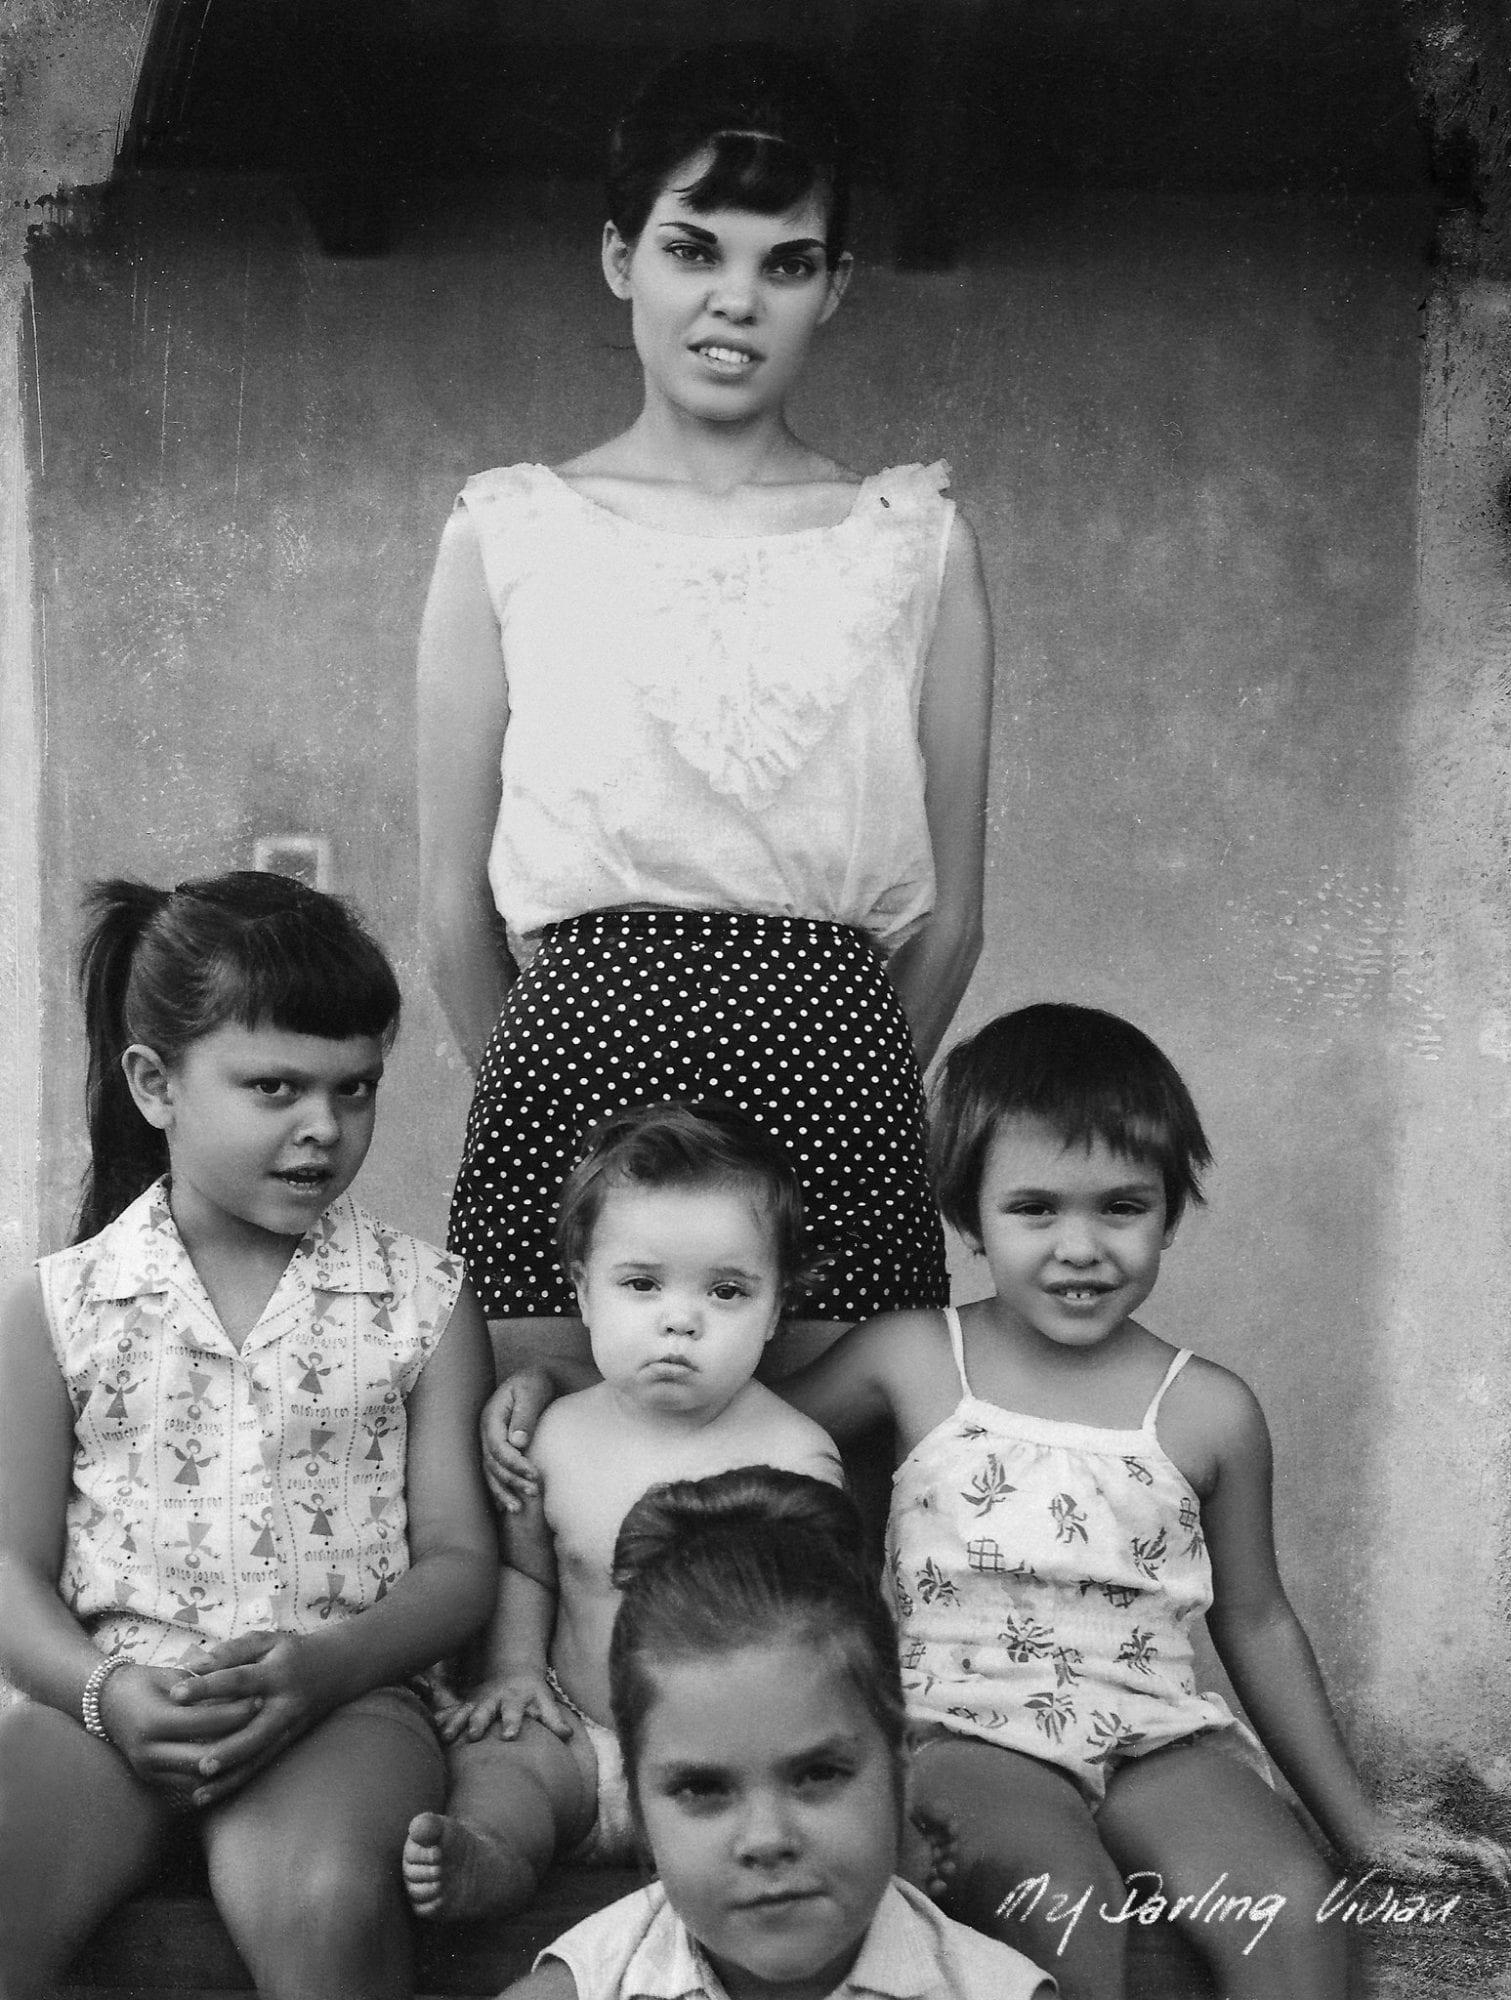 Vivian Liberto and her children